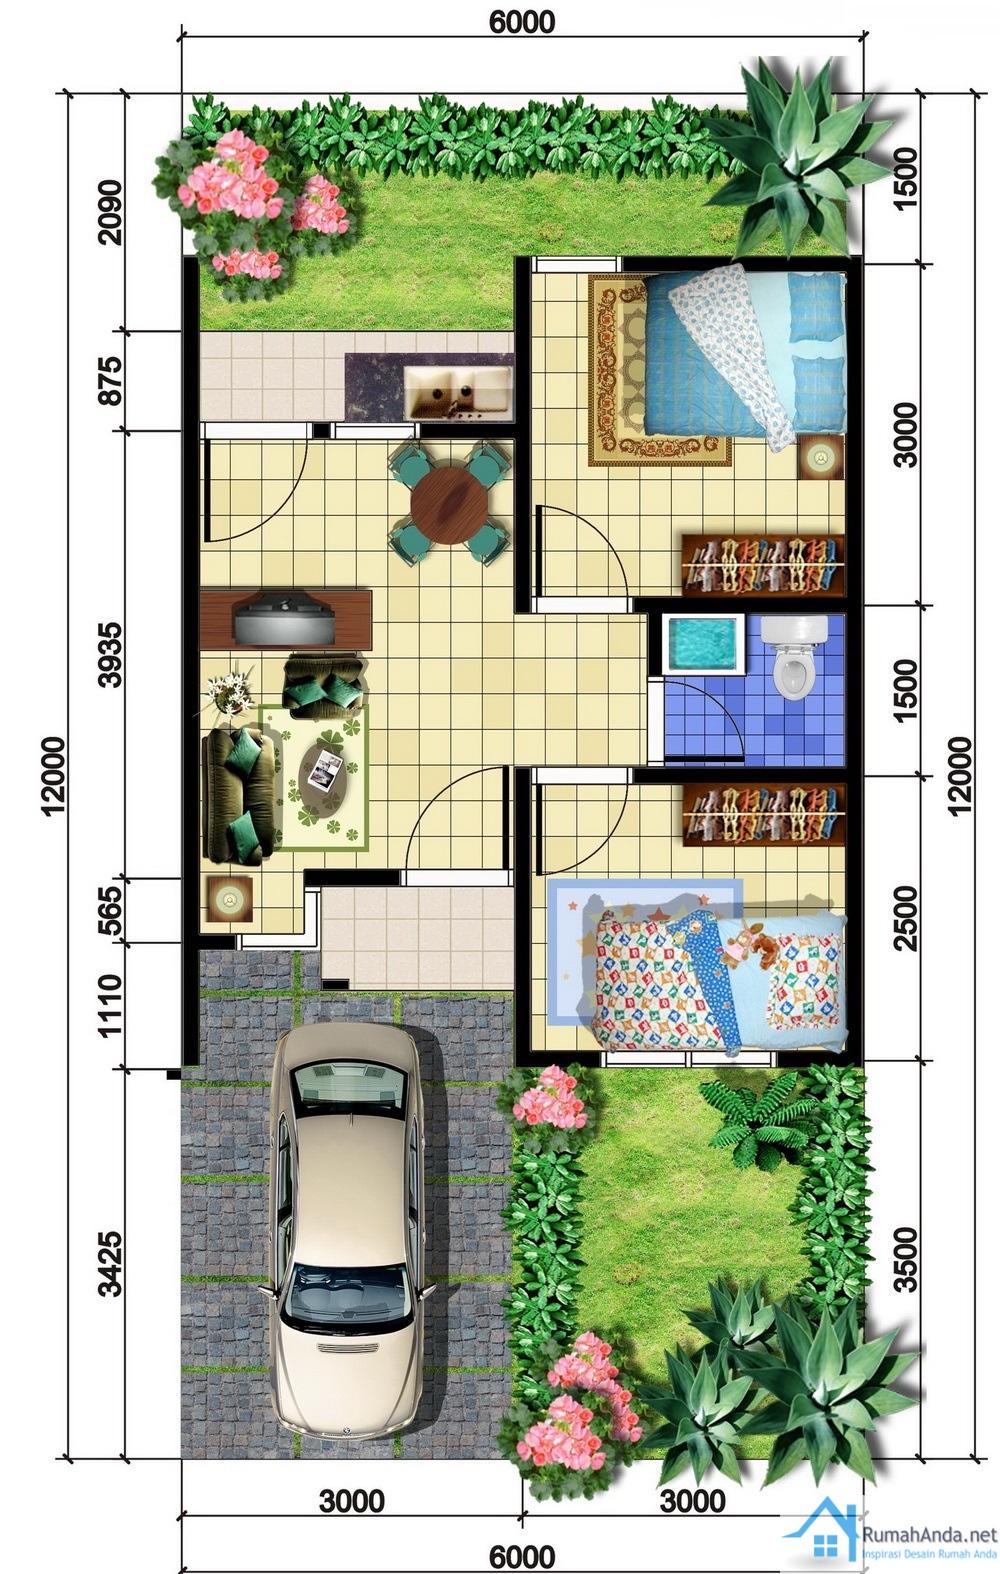 Gambar Rumah Minimalis Ukuran 6 X 14 Agape Locs